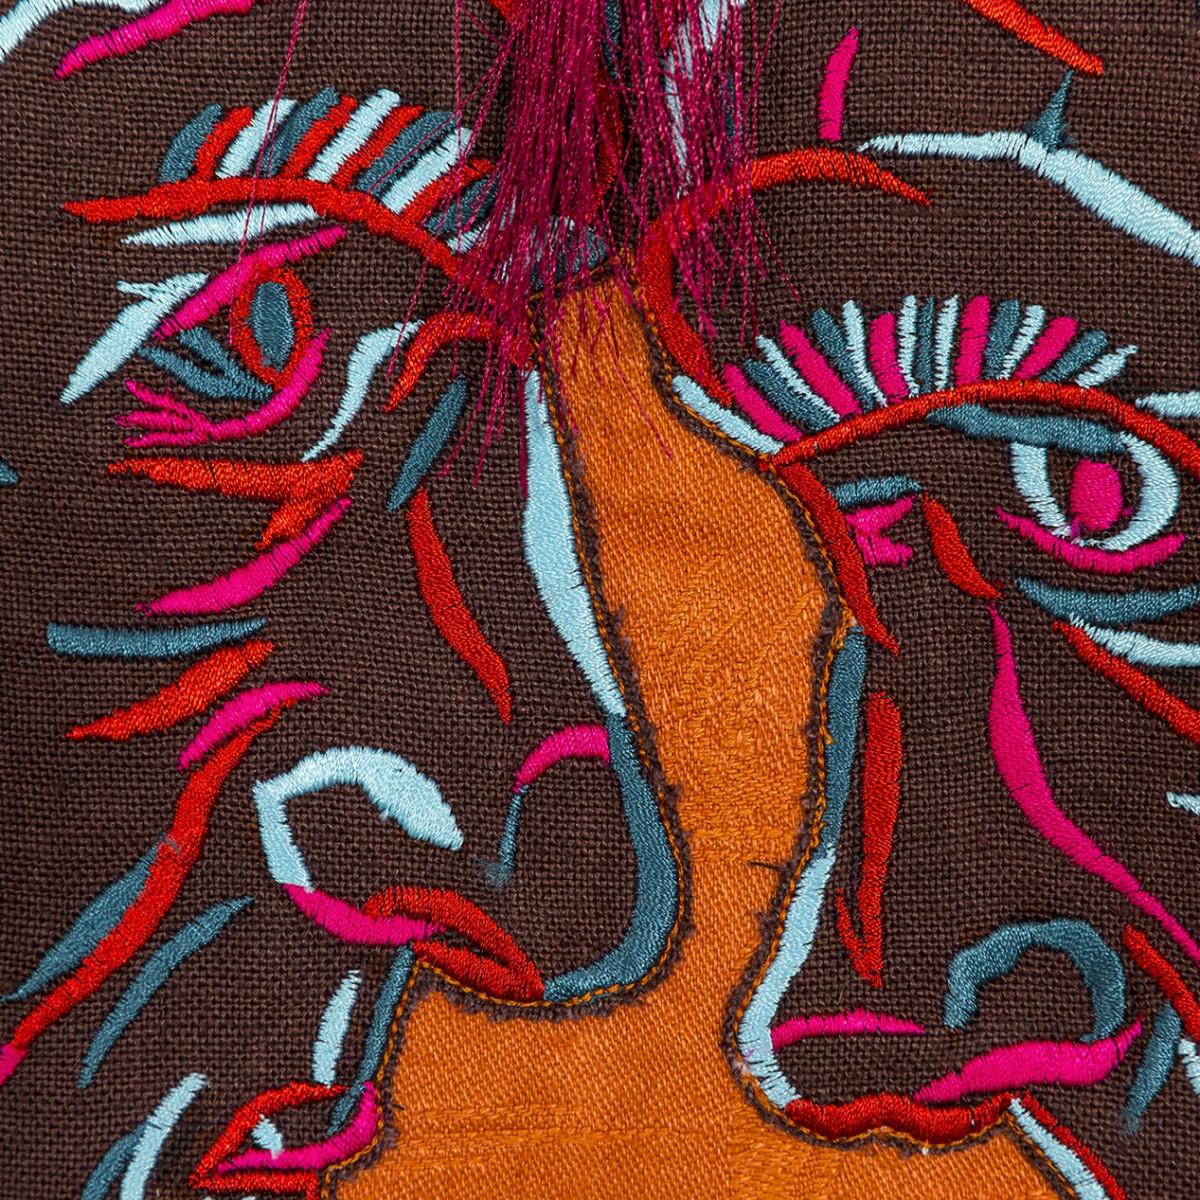 Marcelle Joseph Interviews Textile Artist Henry Hussey